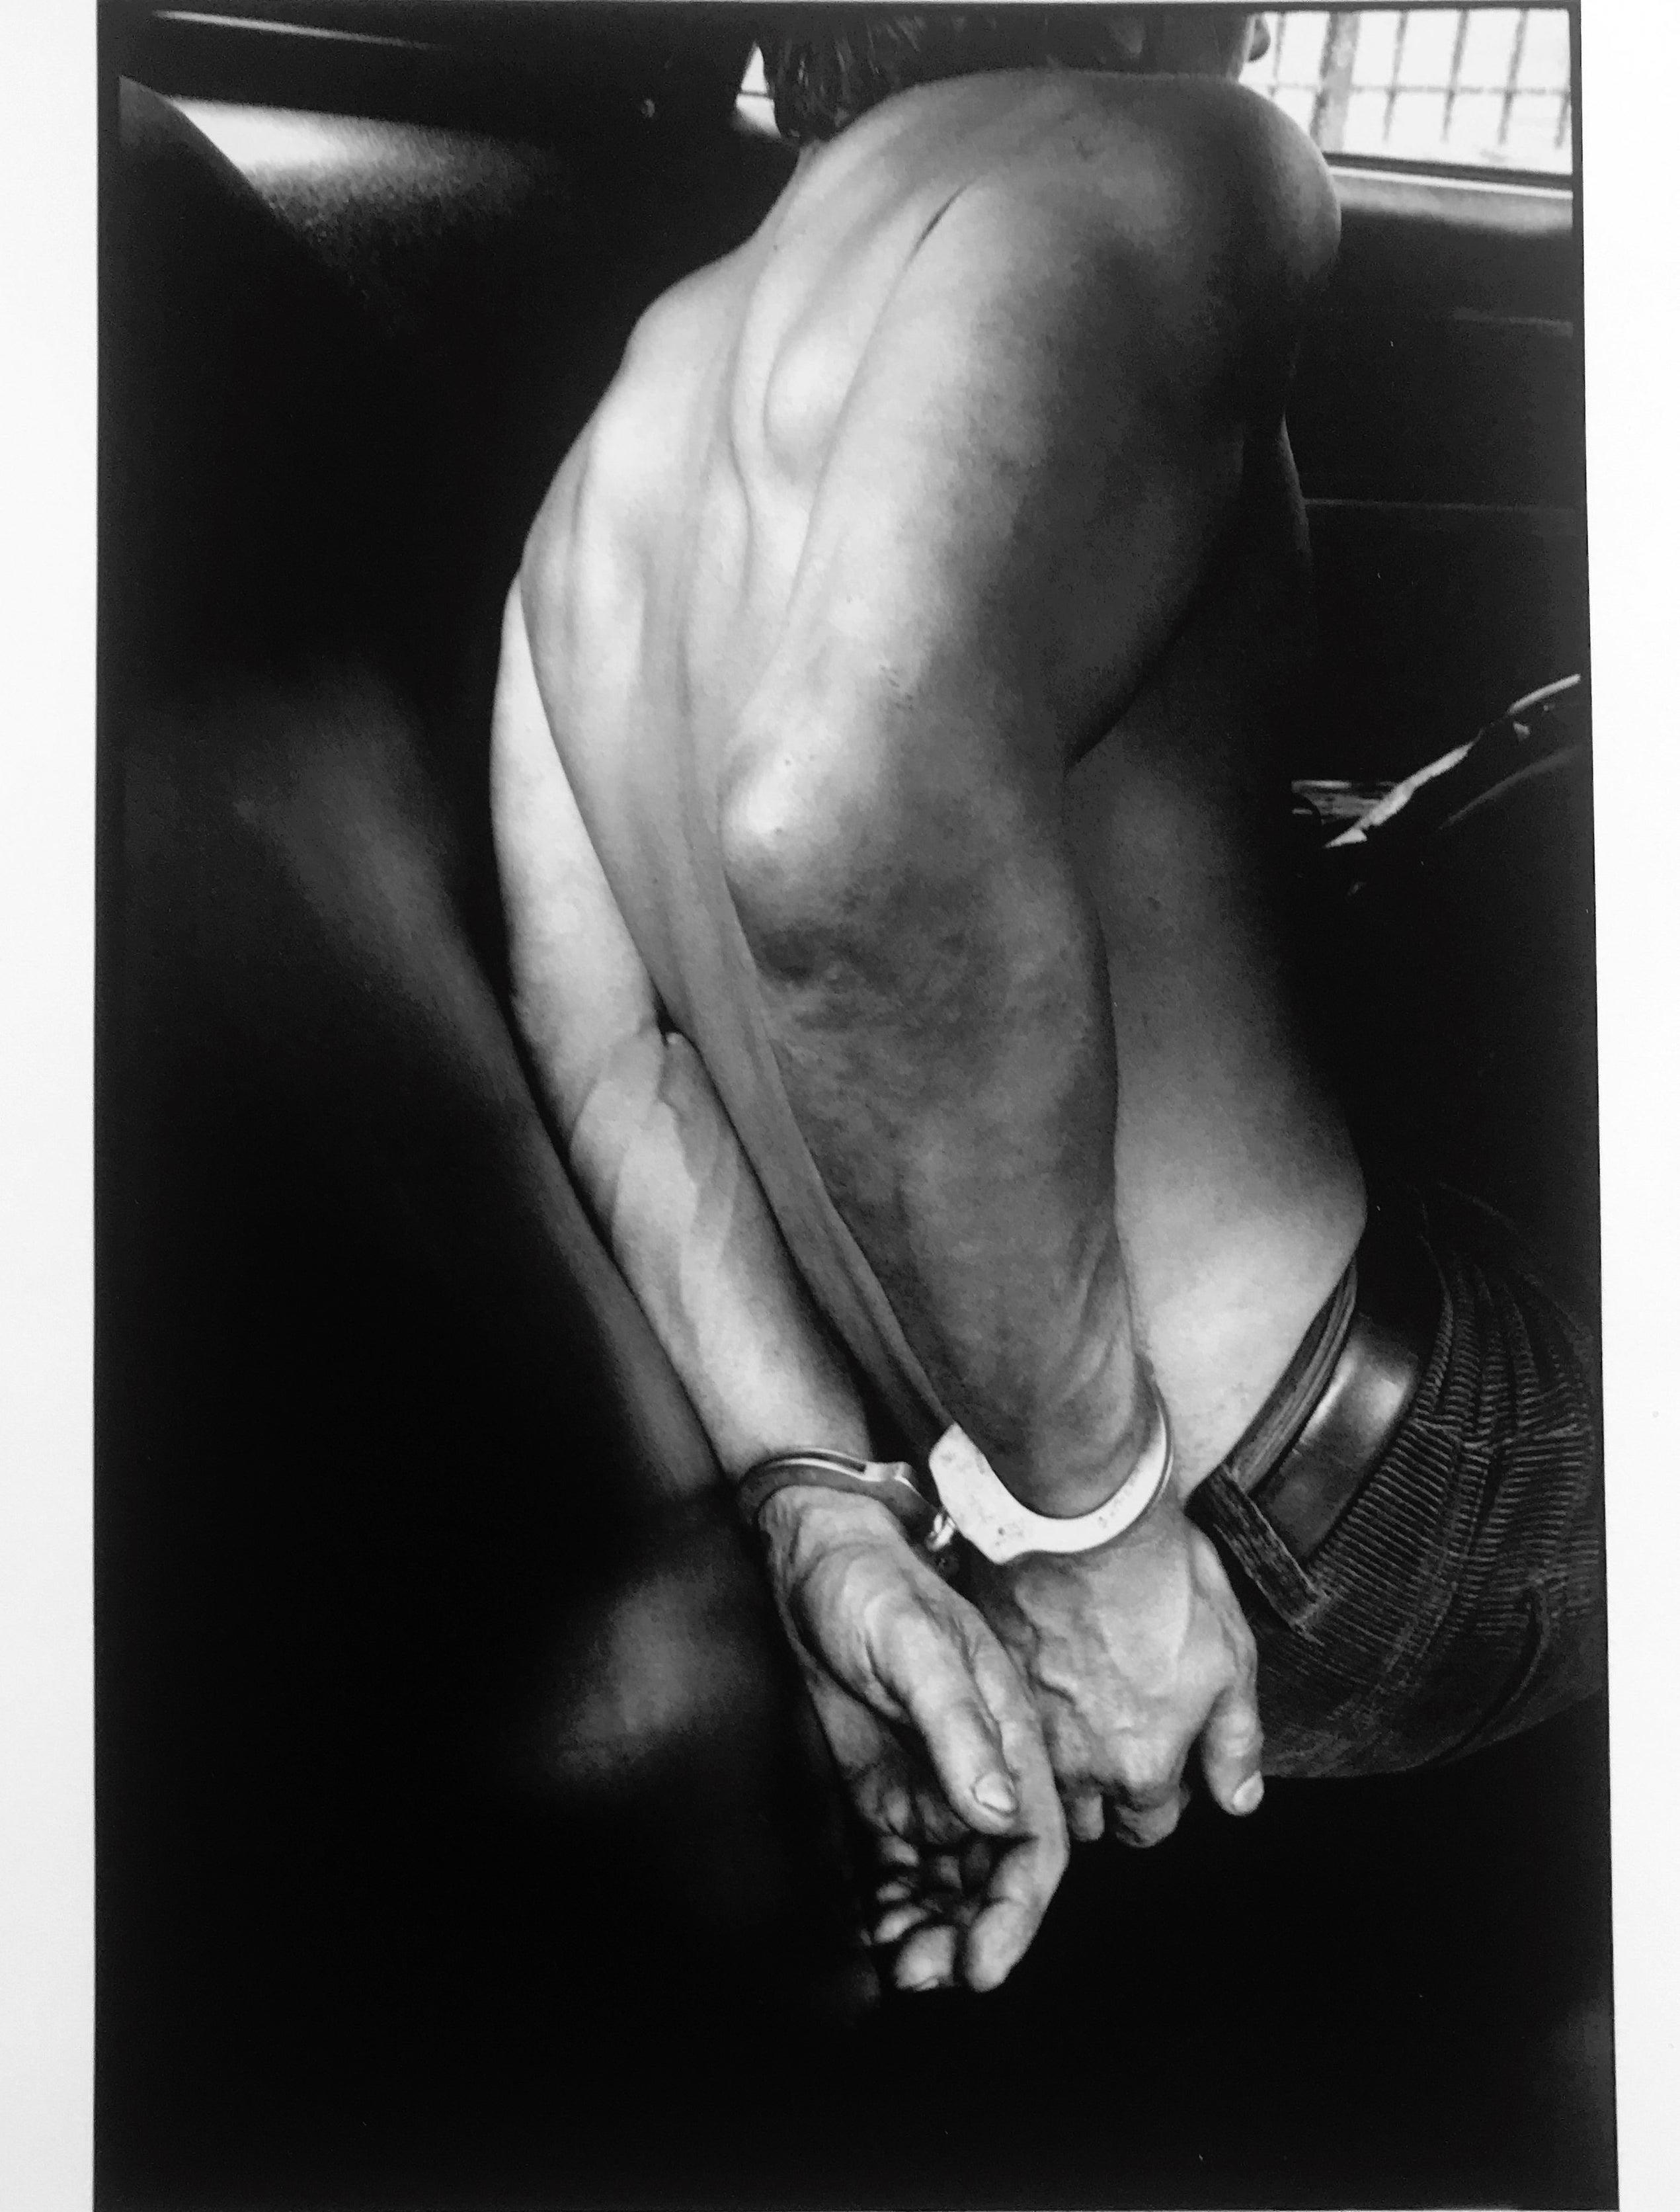 Handcuffed, New York City, Police 1970s Documentary Street Photography